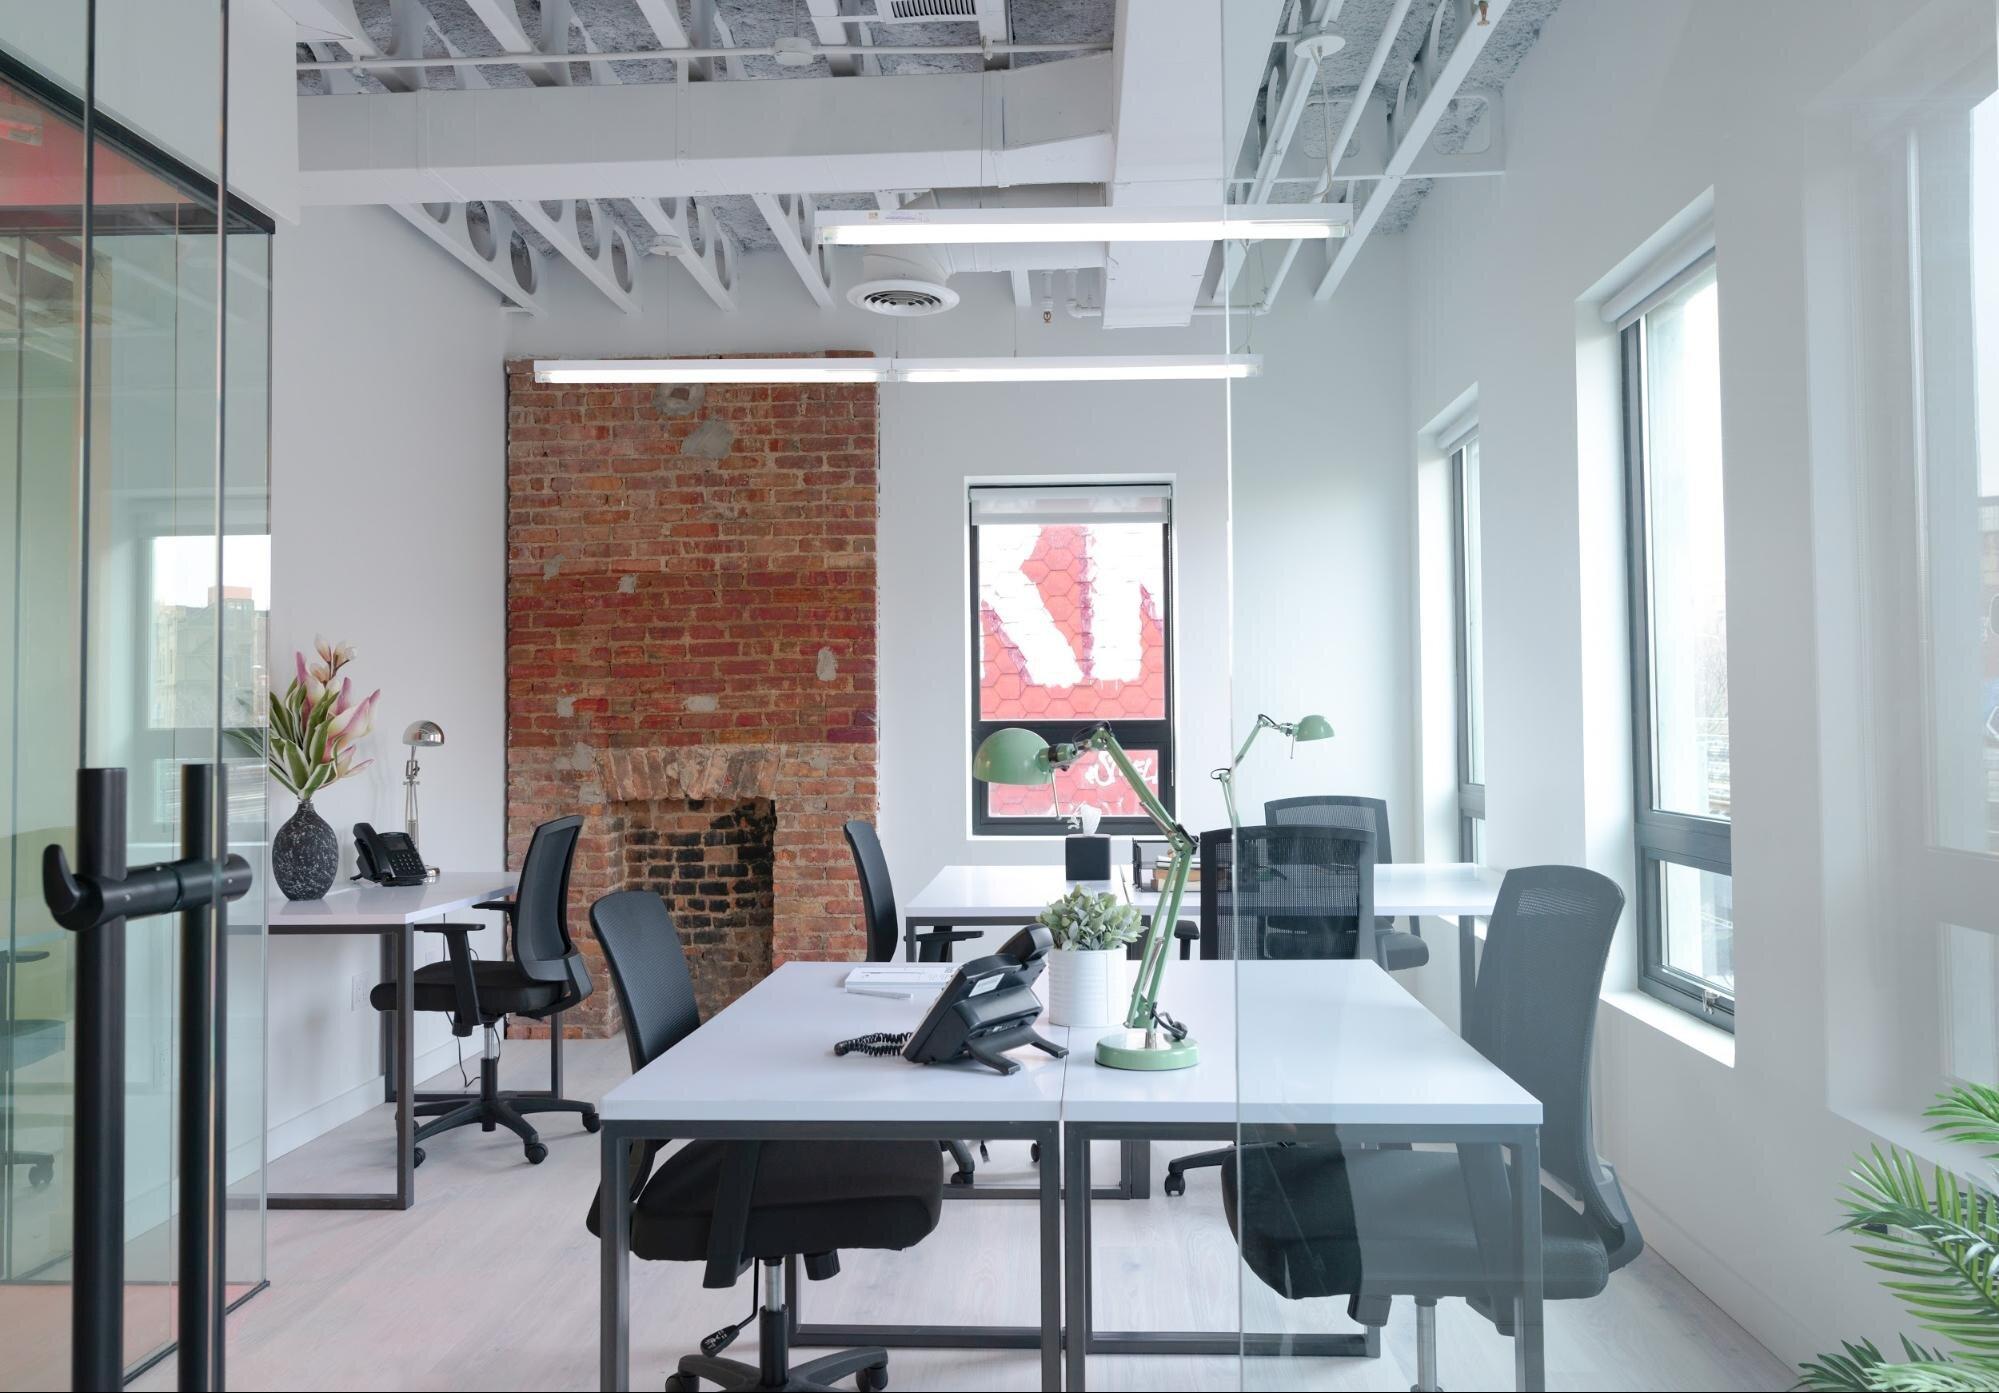 hot desking work space